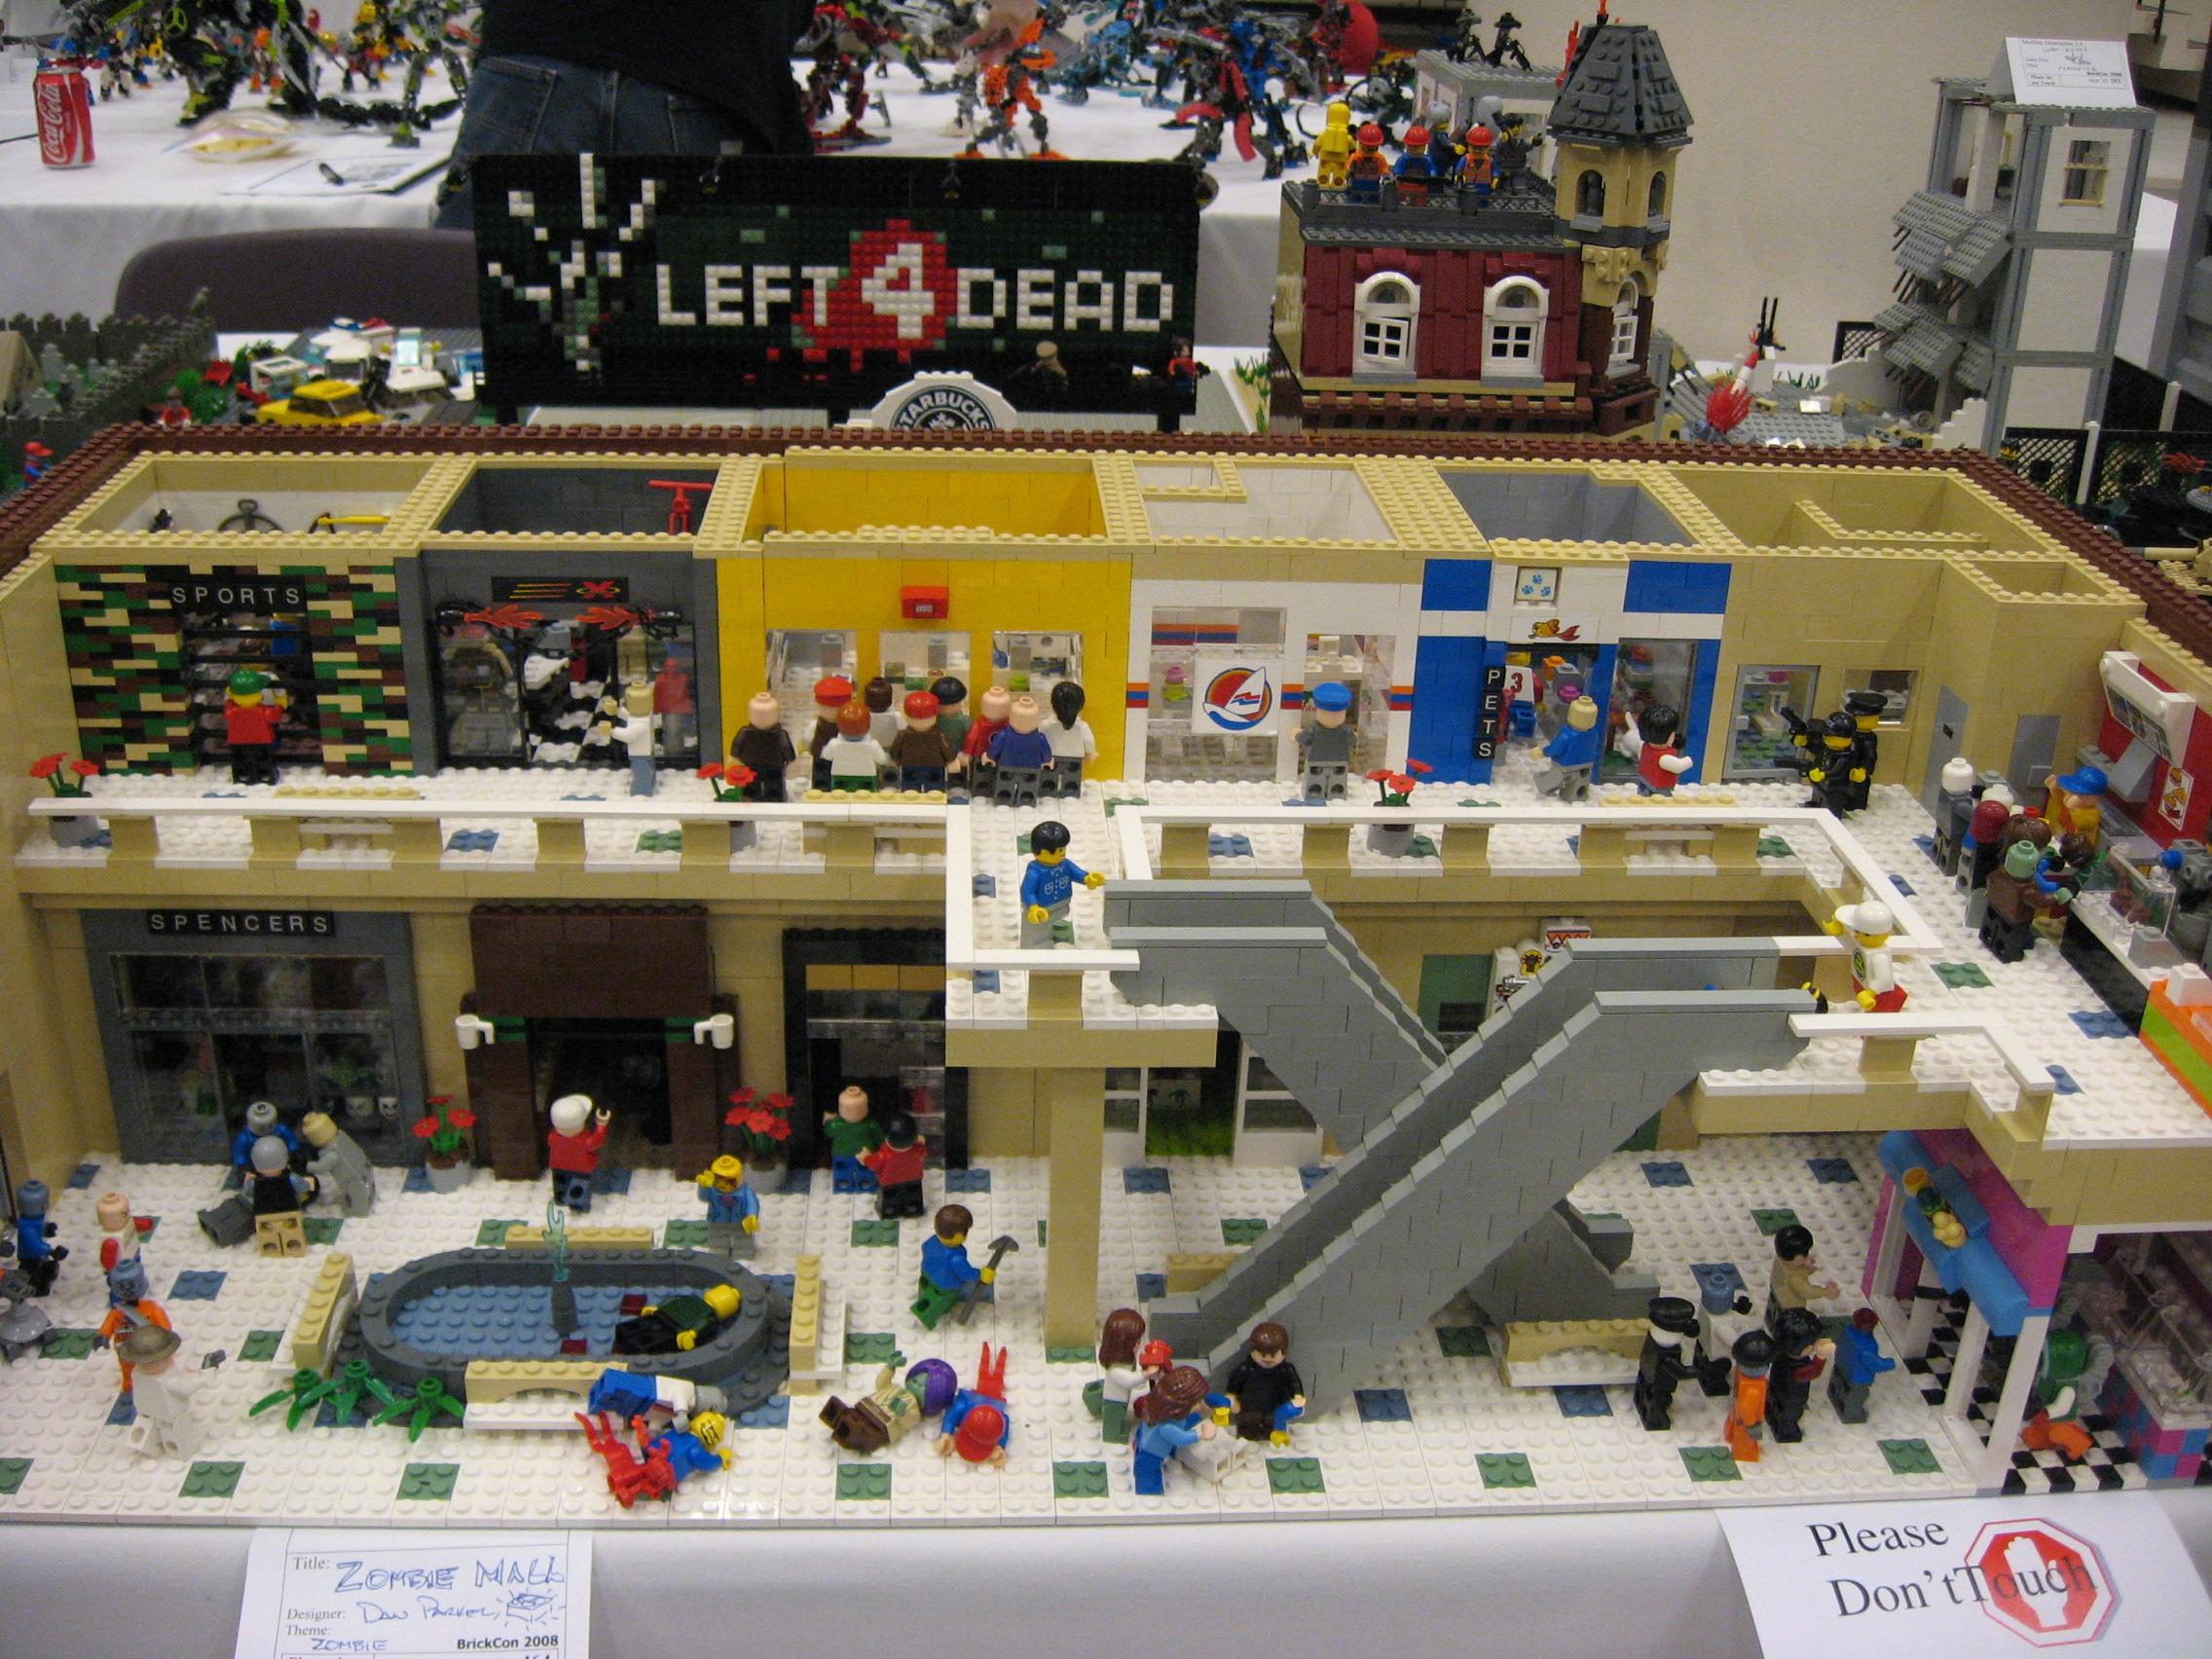 лего зомби апокалипсис игрушки картинки нынешнем